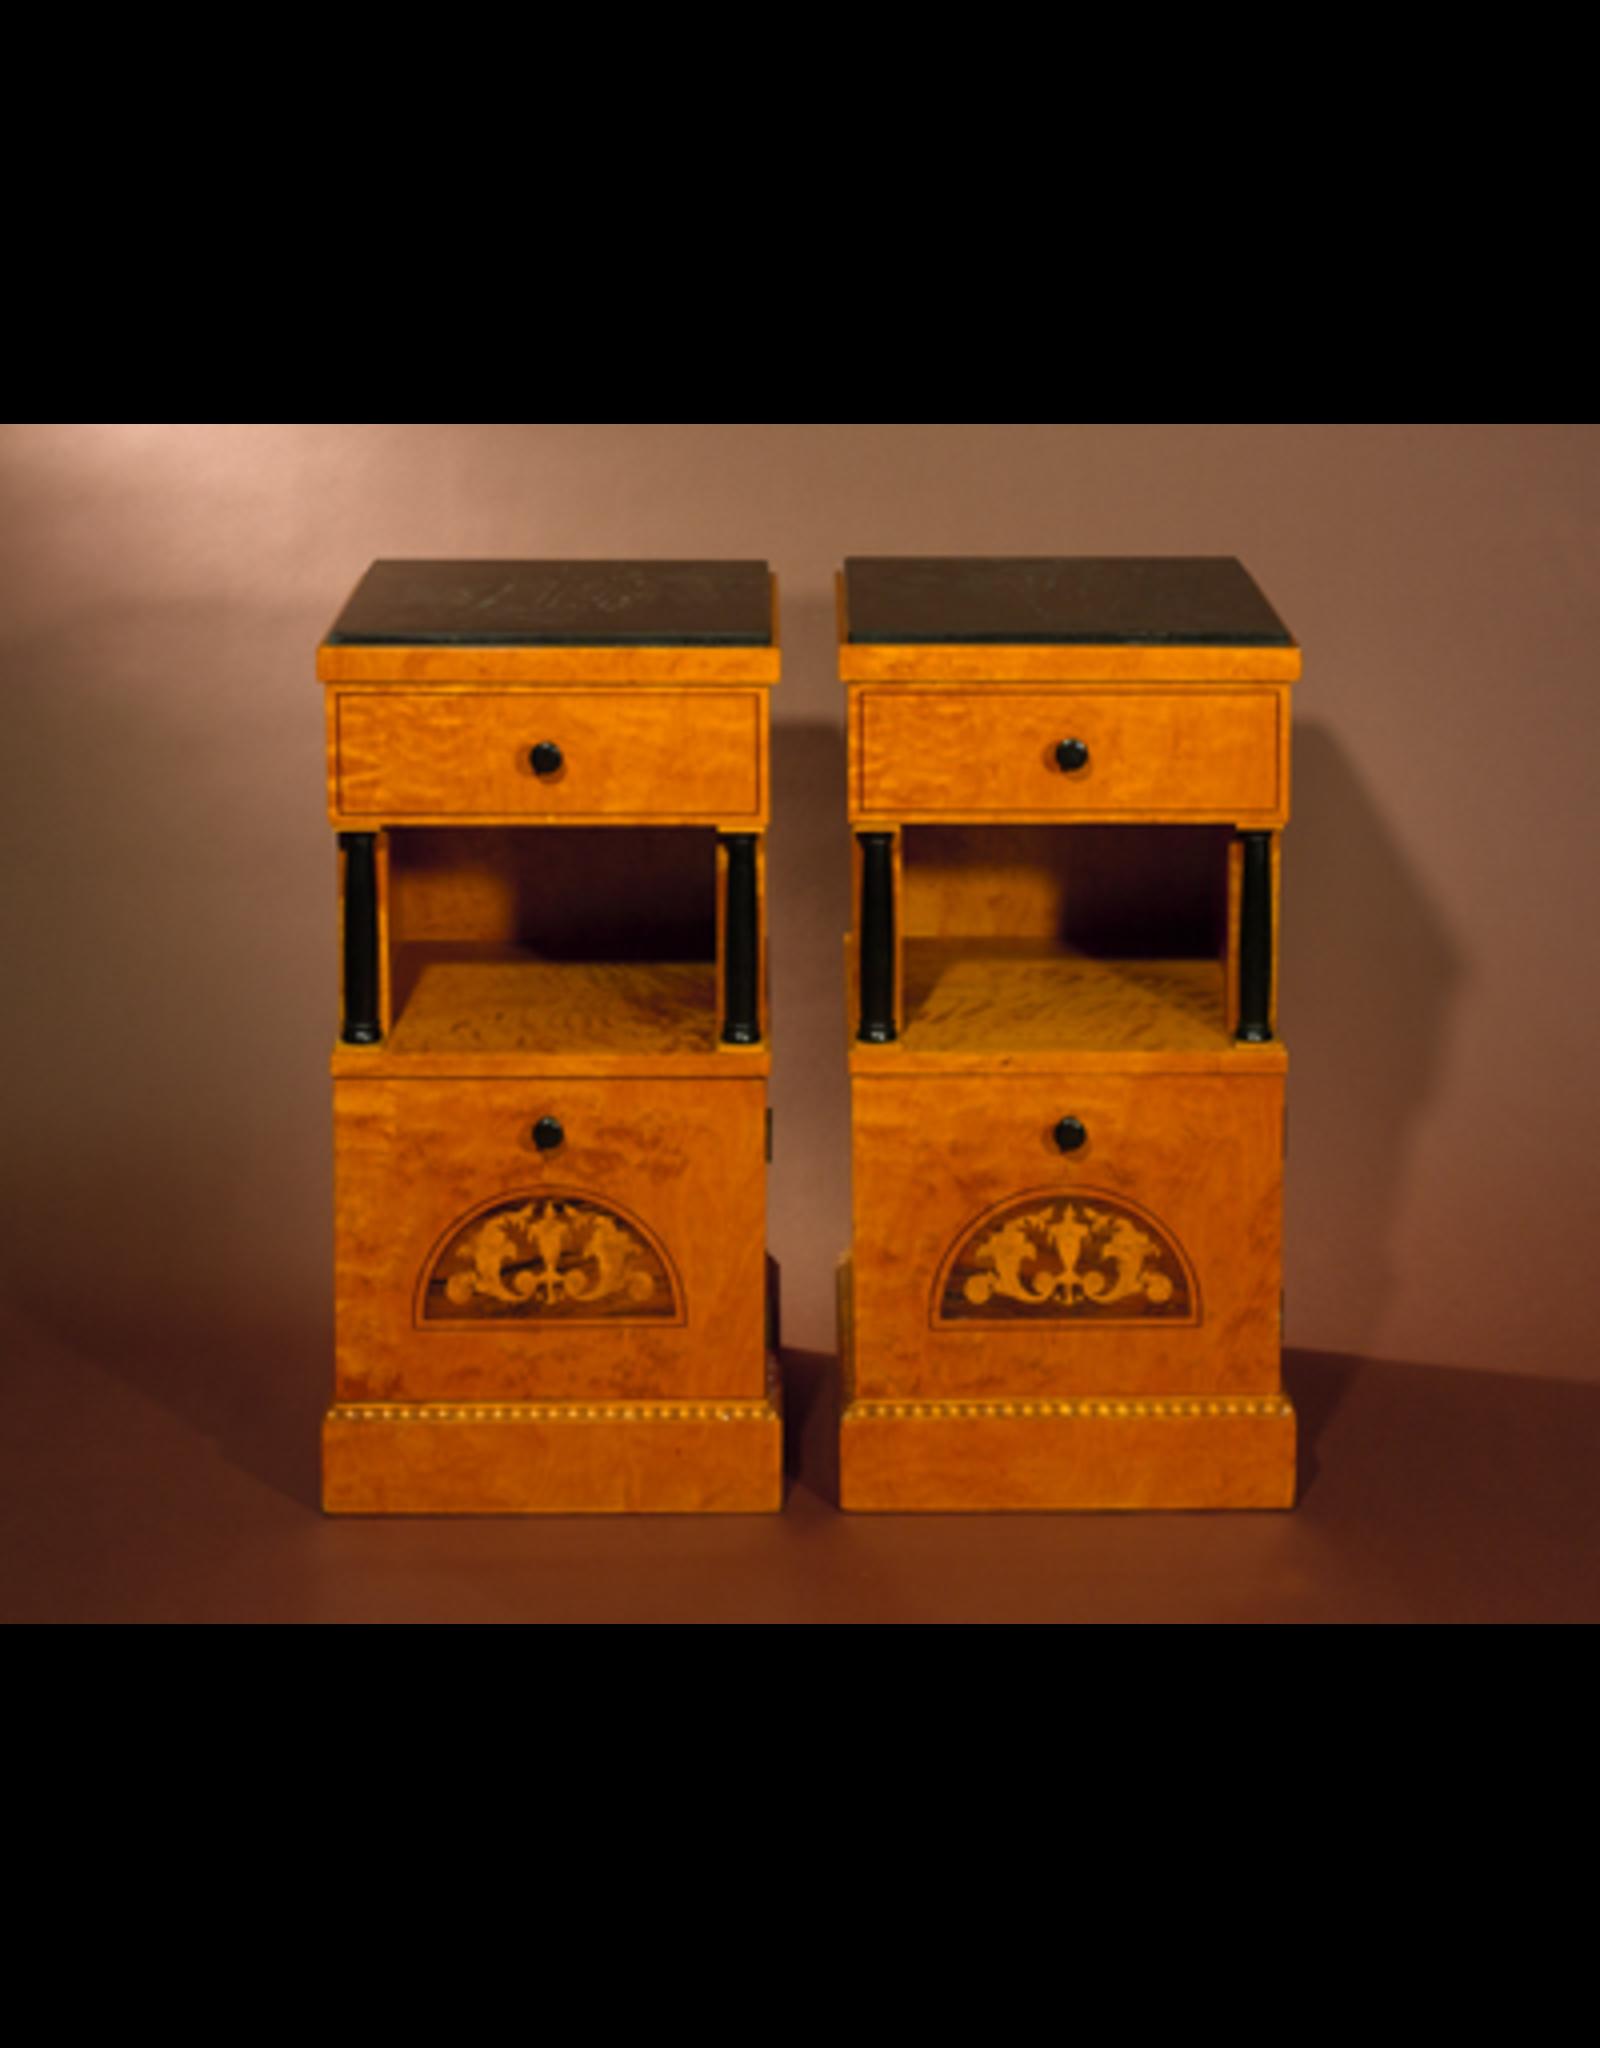 MANKS ANTIQUES PAIR OF BIEDERMEIER CABINETS WITH ROSEWOOD & SATINWOOD INLAYWITH ROSEWOOD & SATINWOOD INLAYSWEDEN  Circa 1910W39 x D38 x H77cm